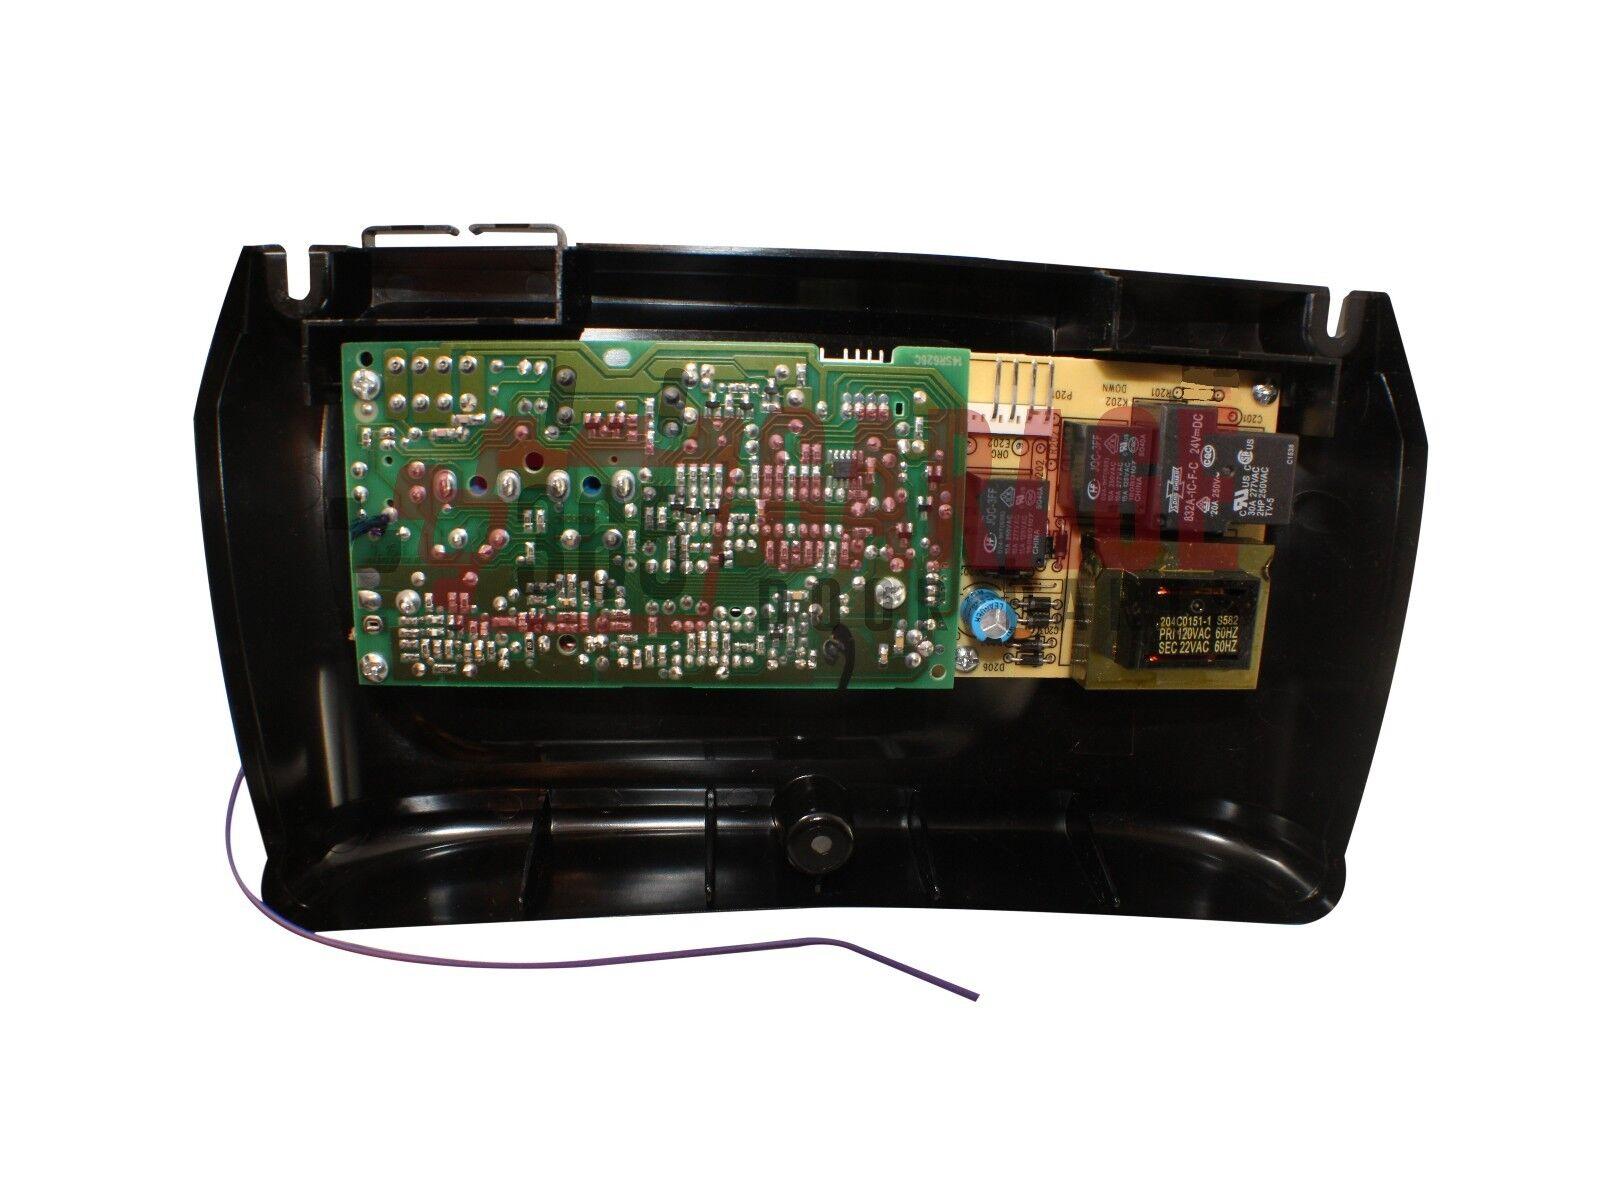 41ac050 1m Chamberlain Liftmaster Garage Door Receiver Logic Circuit Board 640213243001 Ebay